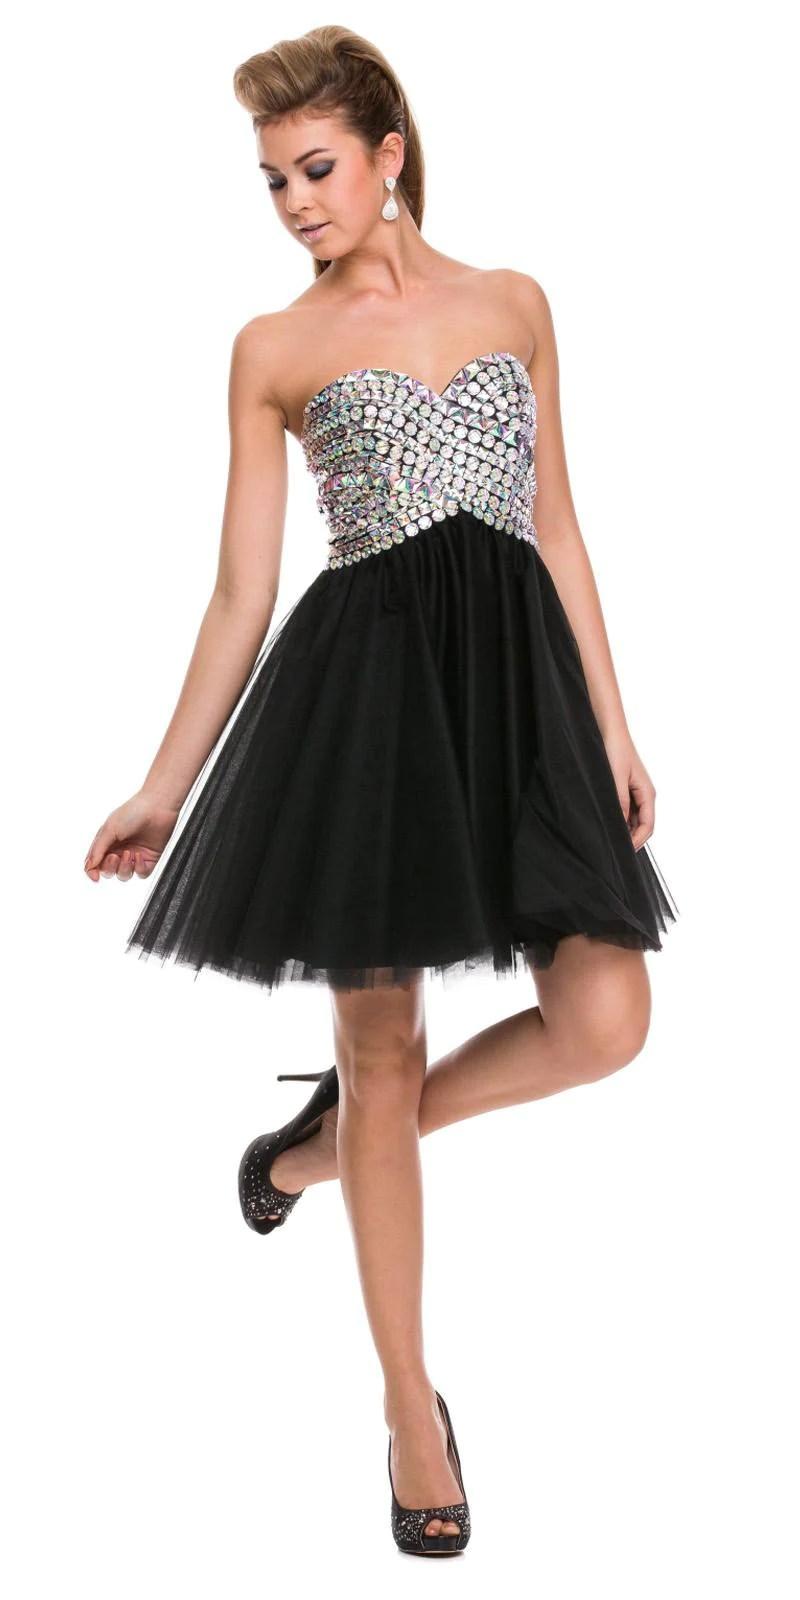 Sweetheart Neckline Strapless Short Prom Dress Rhinestone